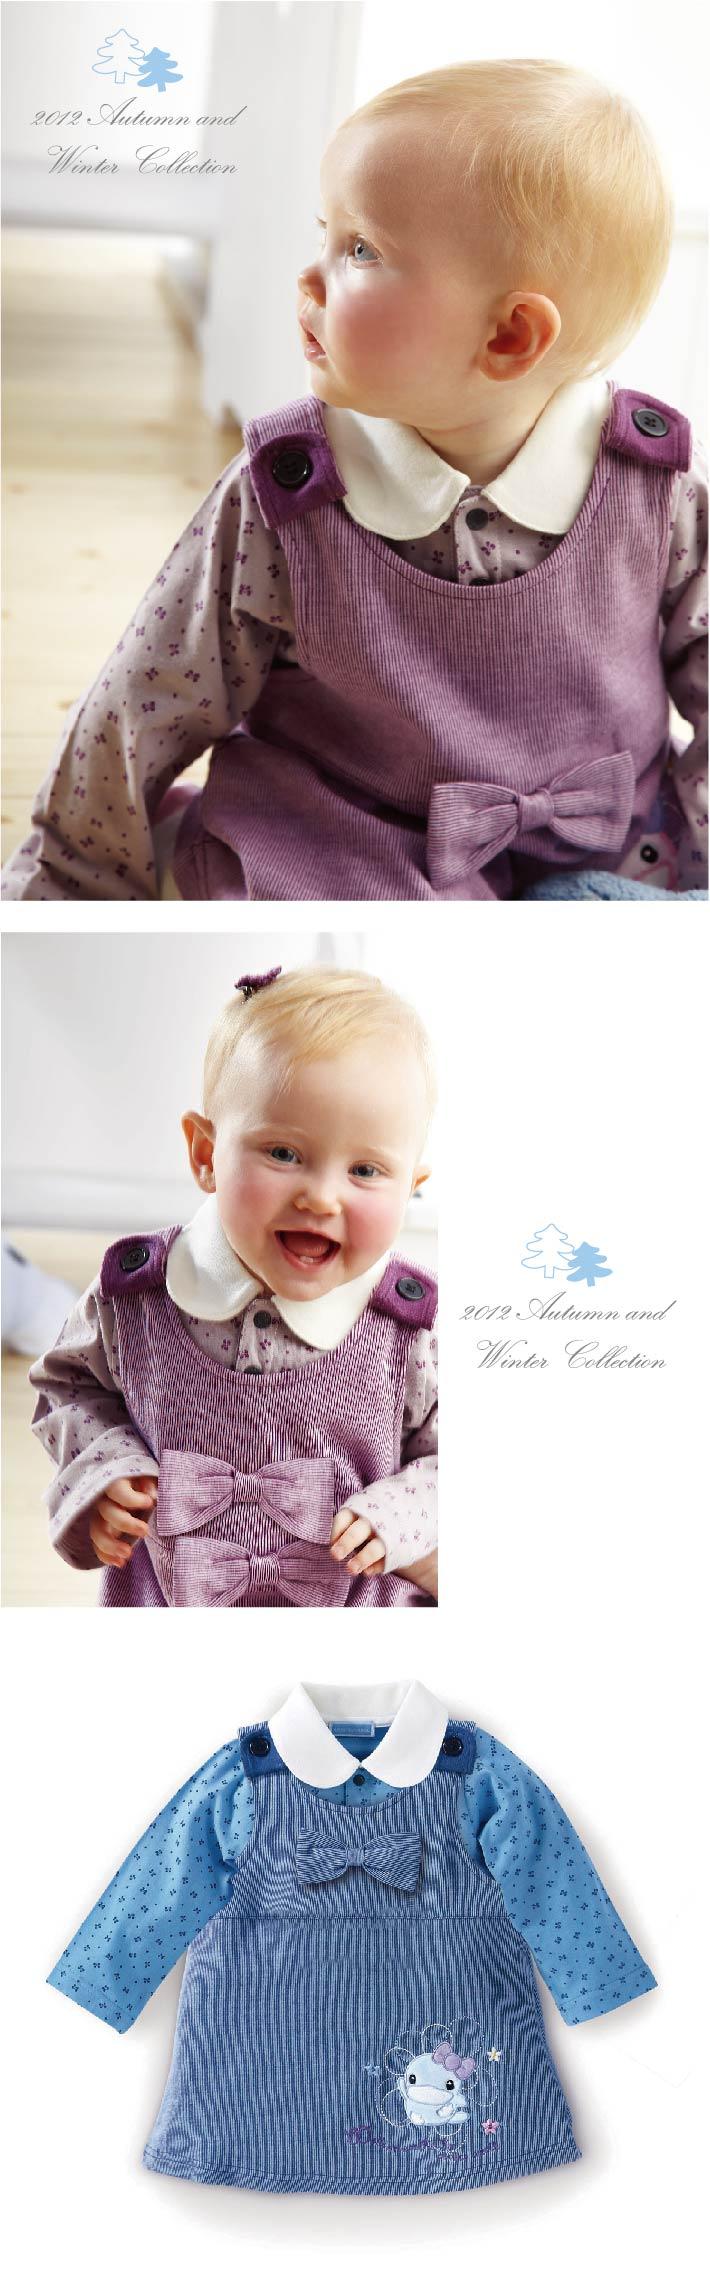 proimages/Seasonal_clothing/2012Autumn_Winter/8407/KU8407.jpg